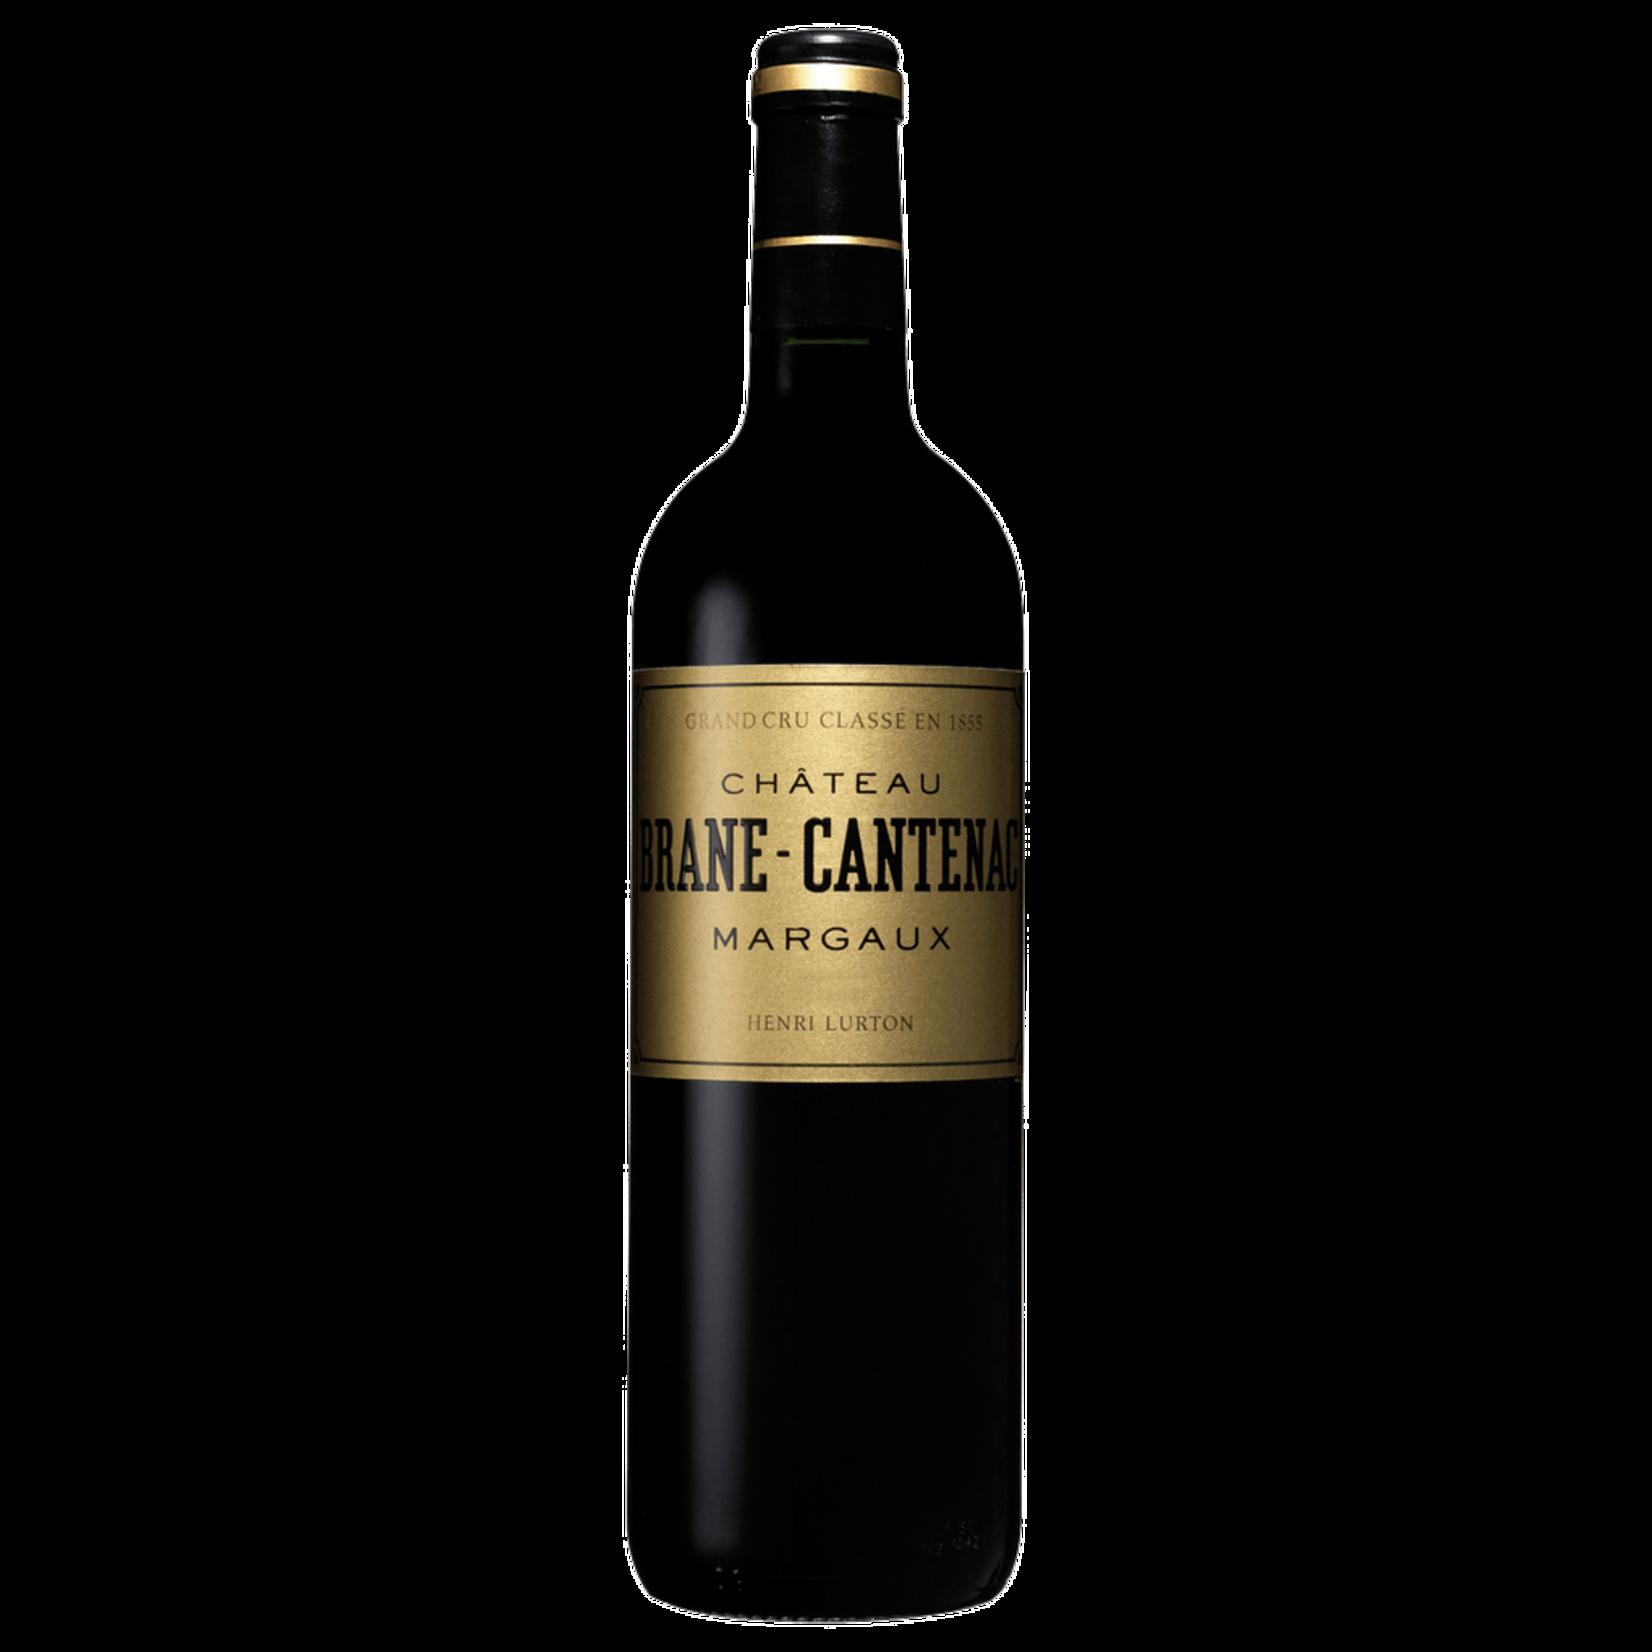 Wine Chateau Brane Cantenac 2005